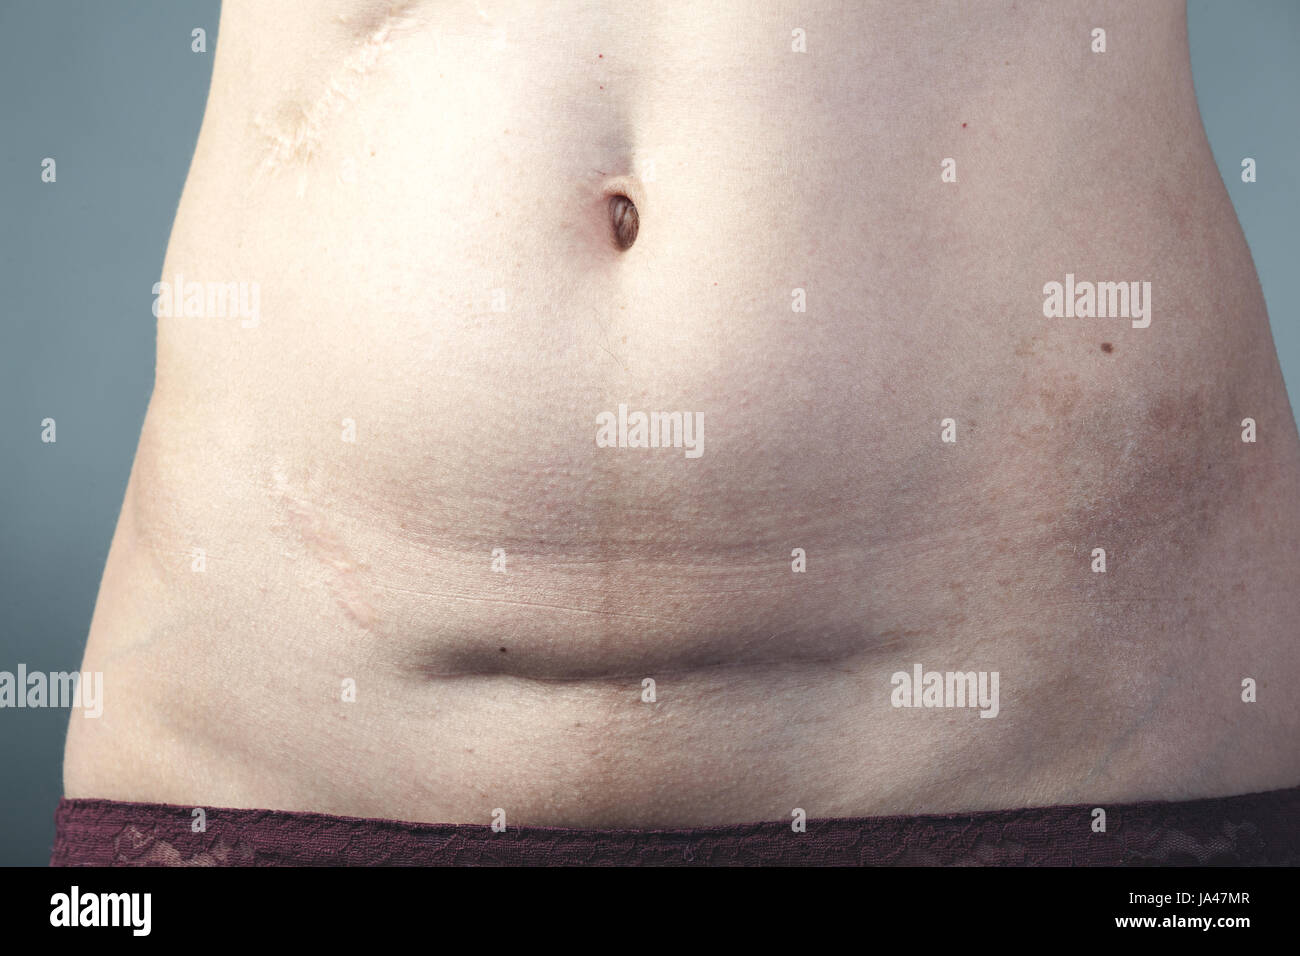 Bauchschnitt Narbe